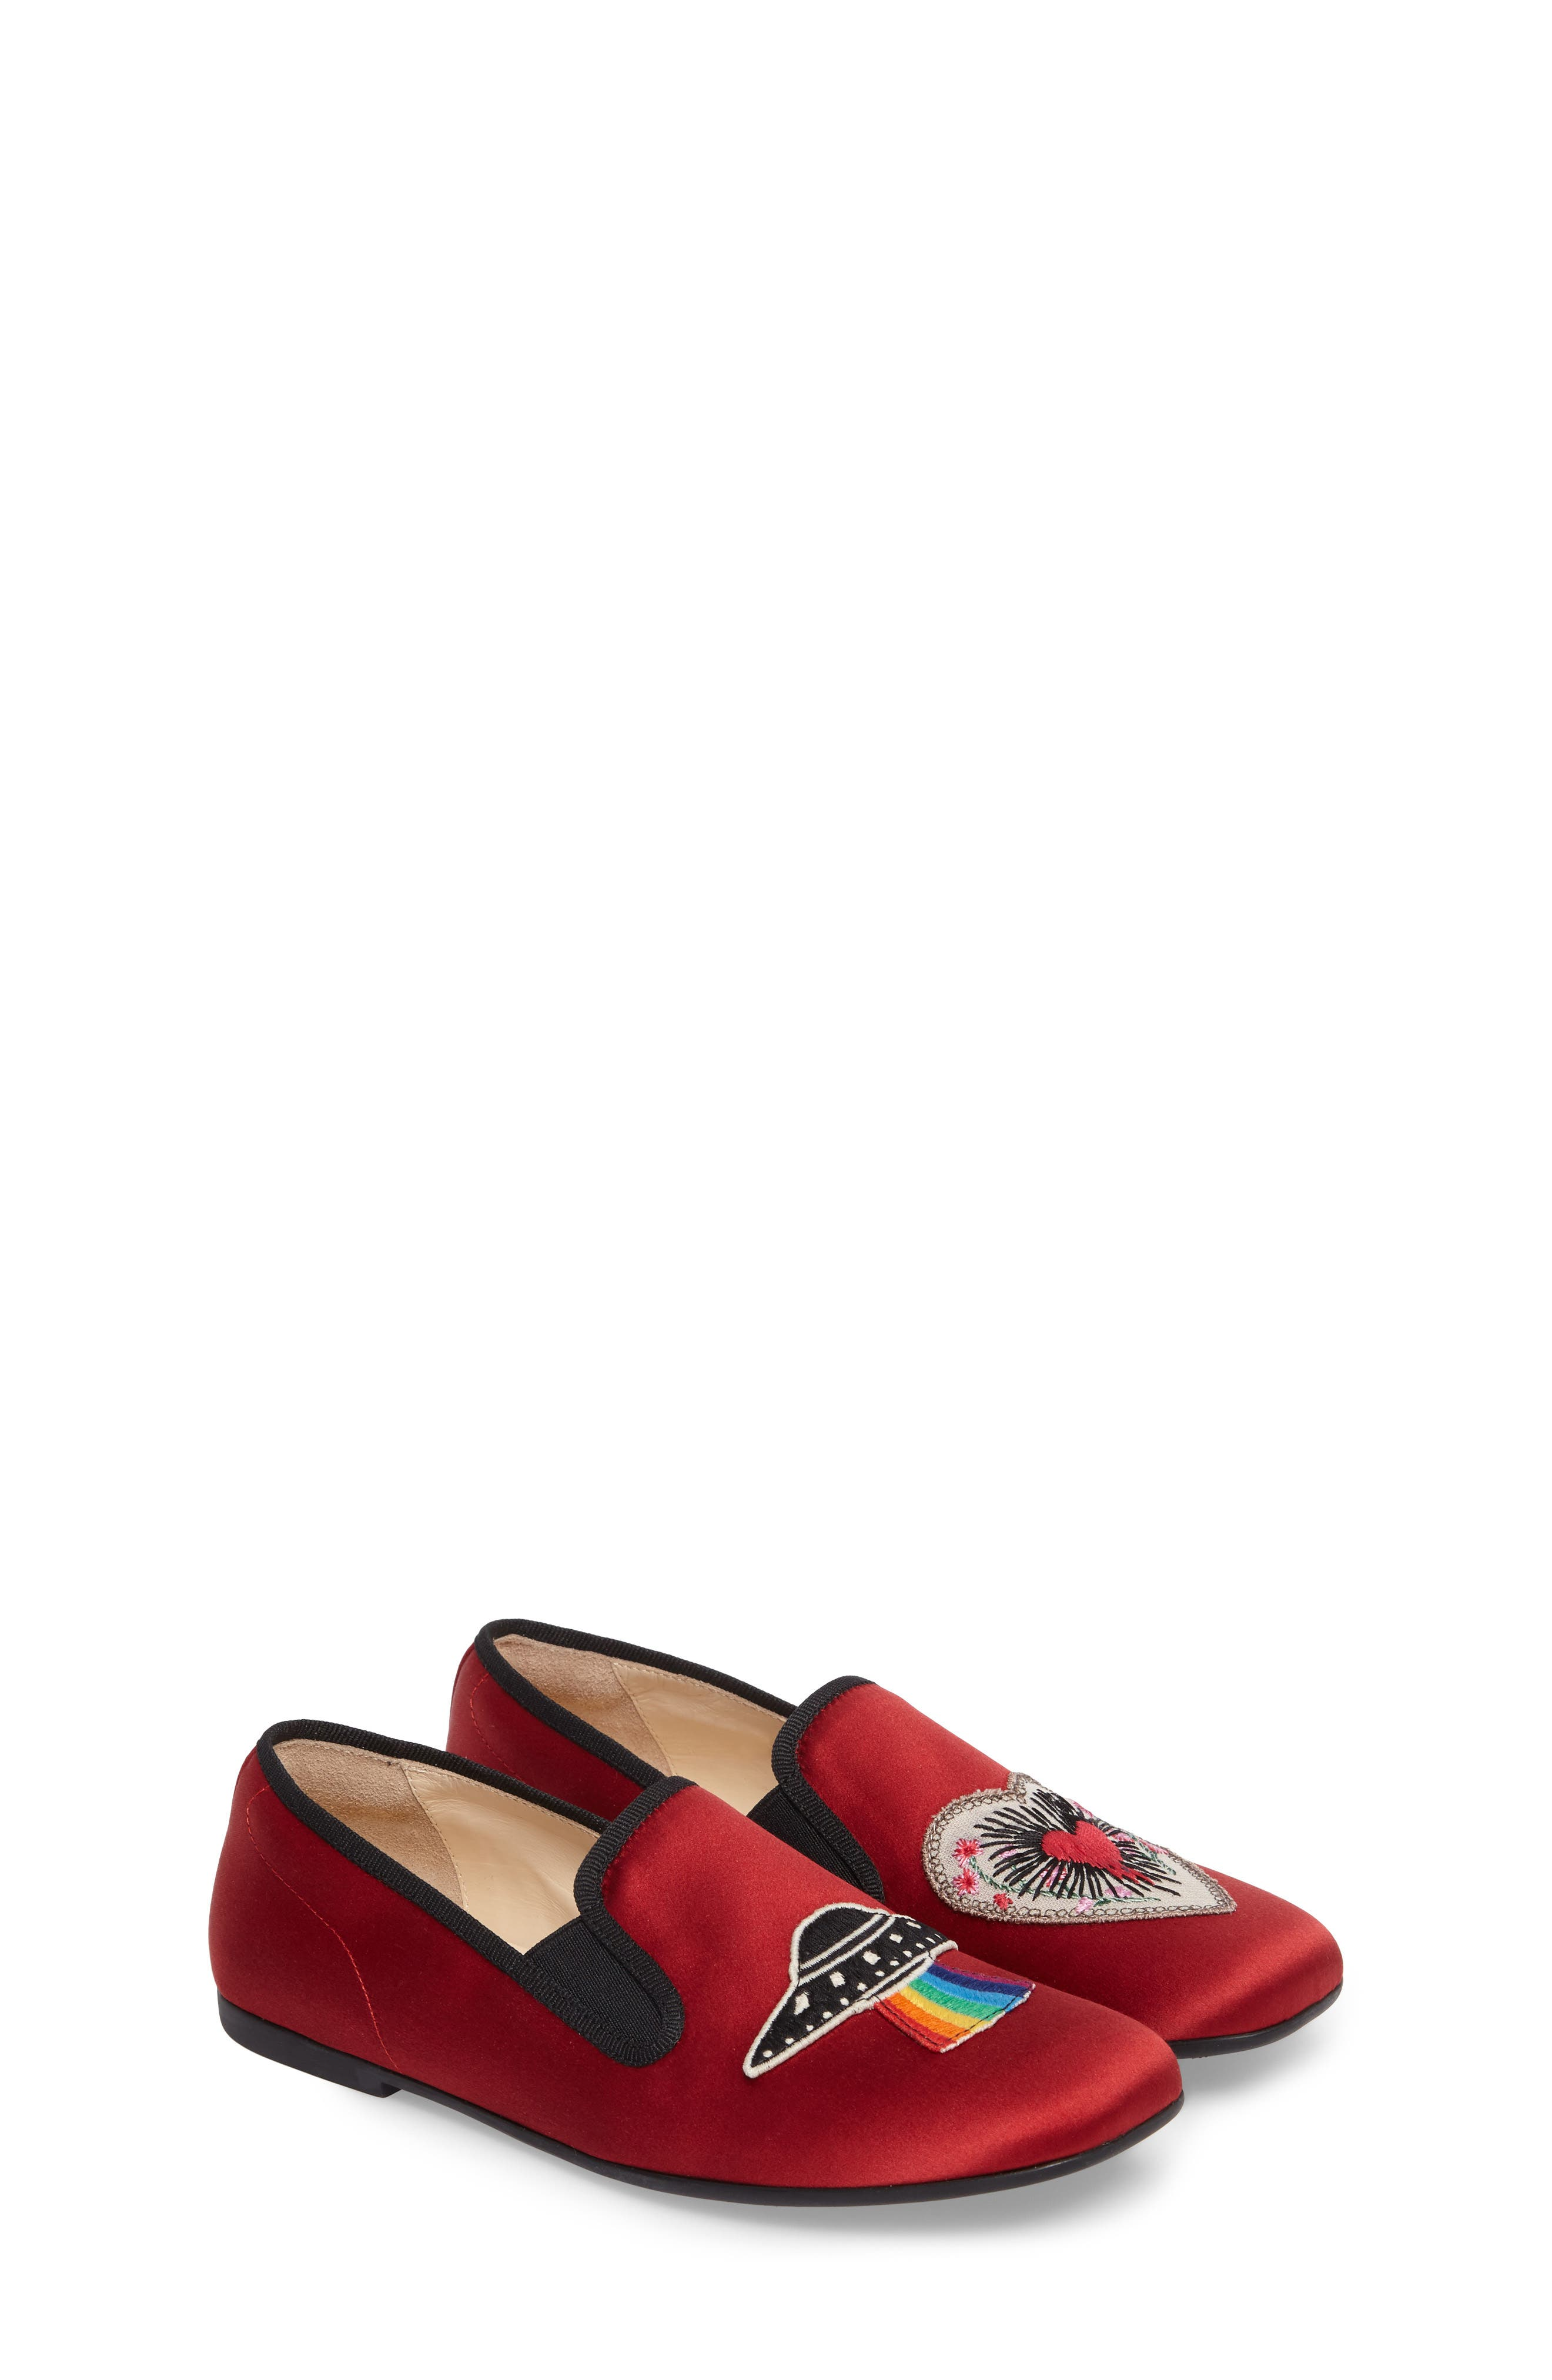 Nannie Appliqué Loafer Flat,                             Main thumbnail 1, color,                             Red